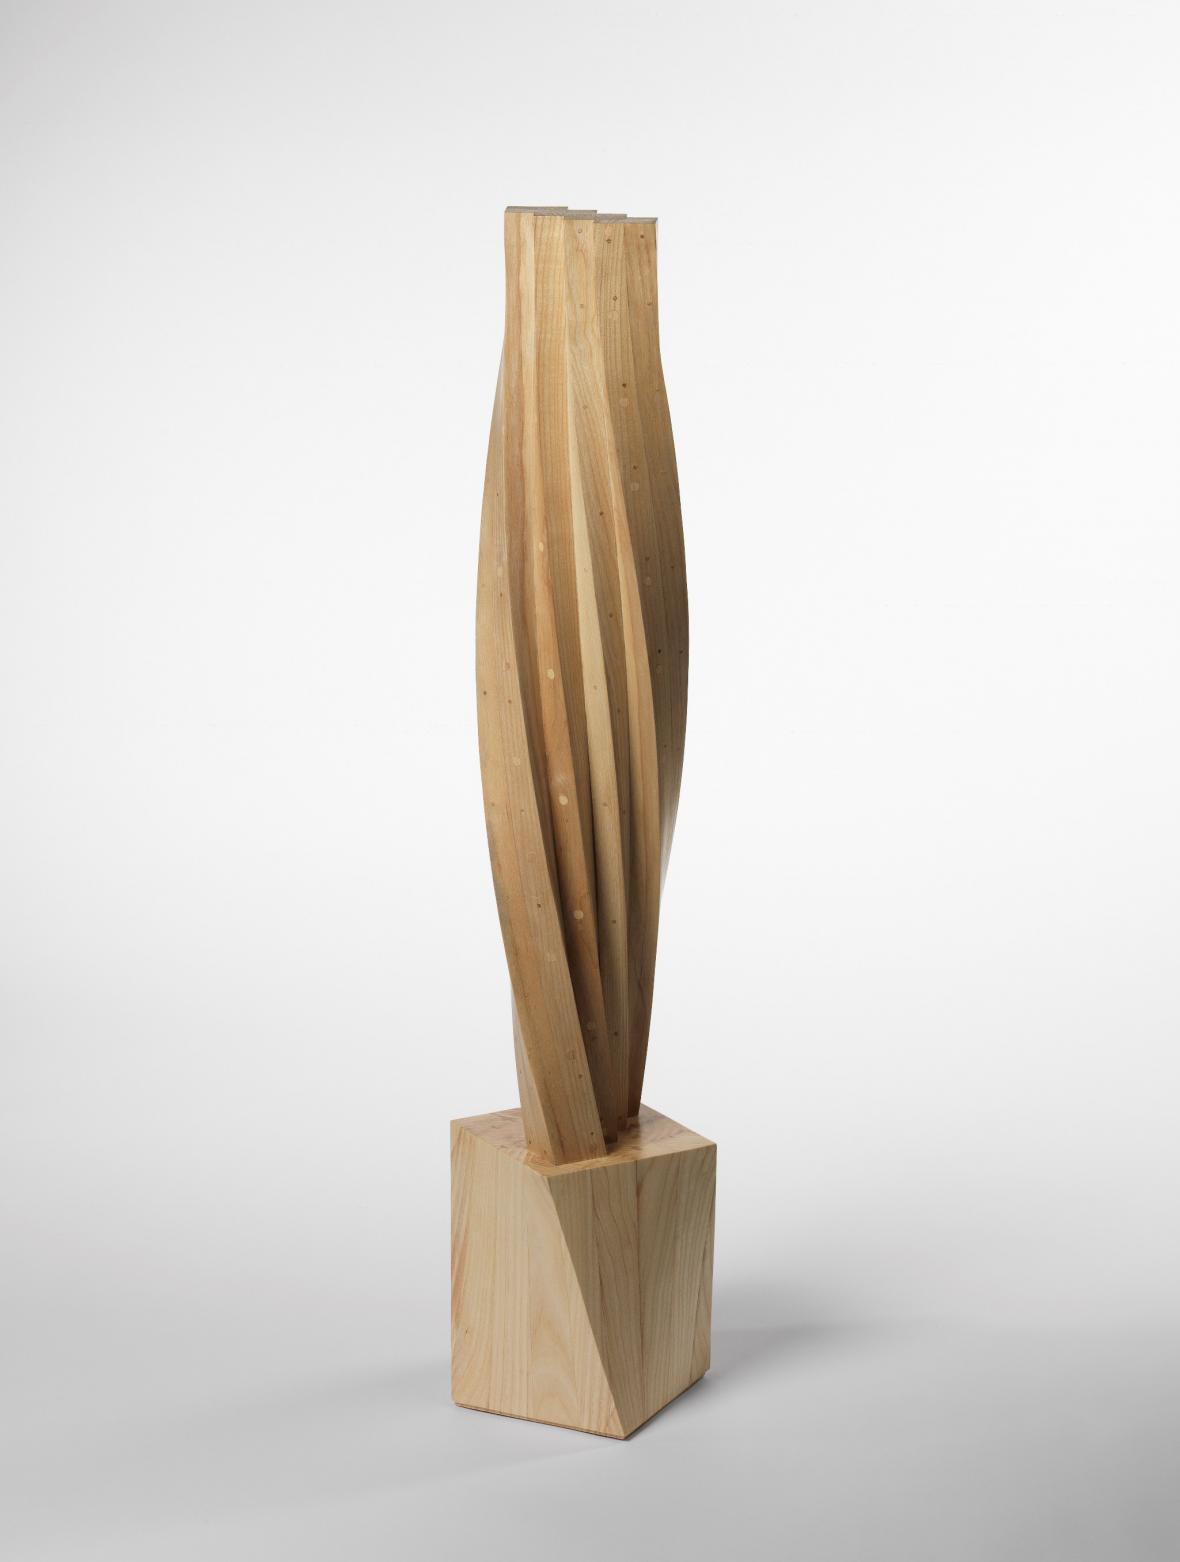 Richard Deacon / Shiver My Timbers č. 17